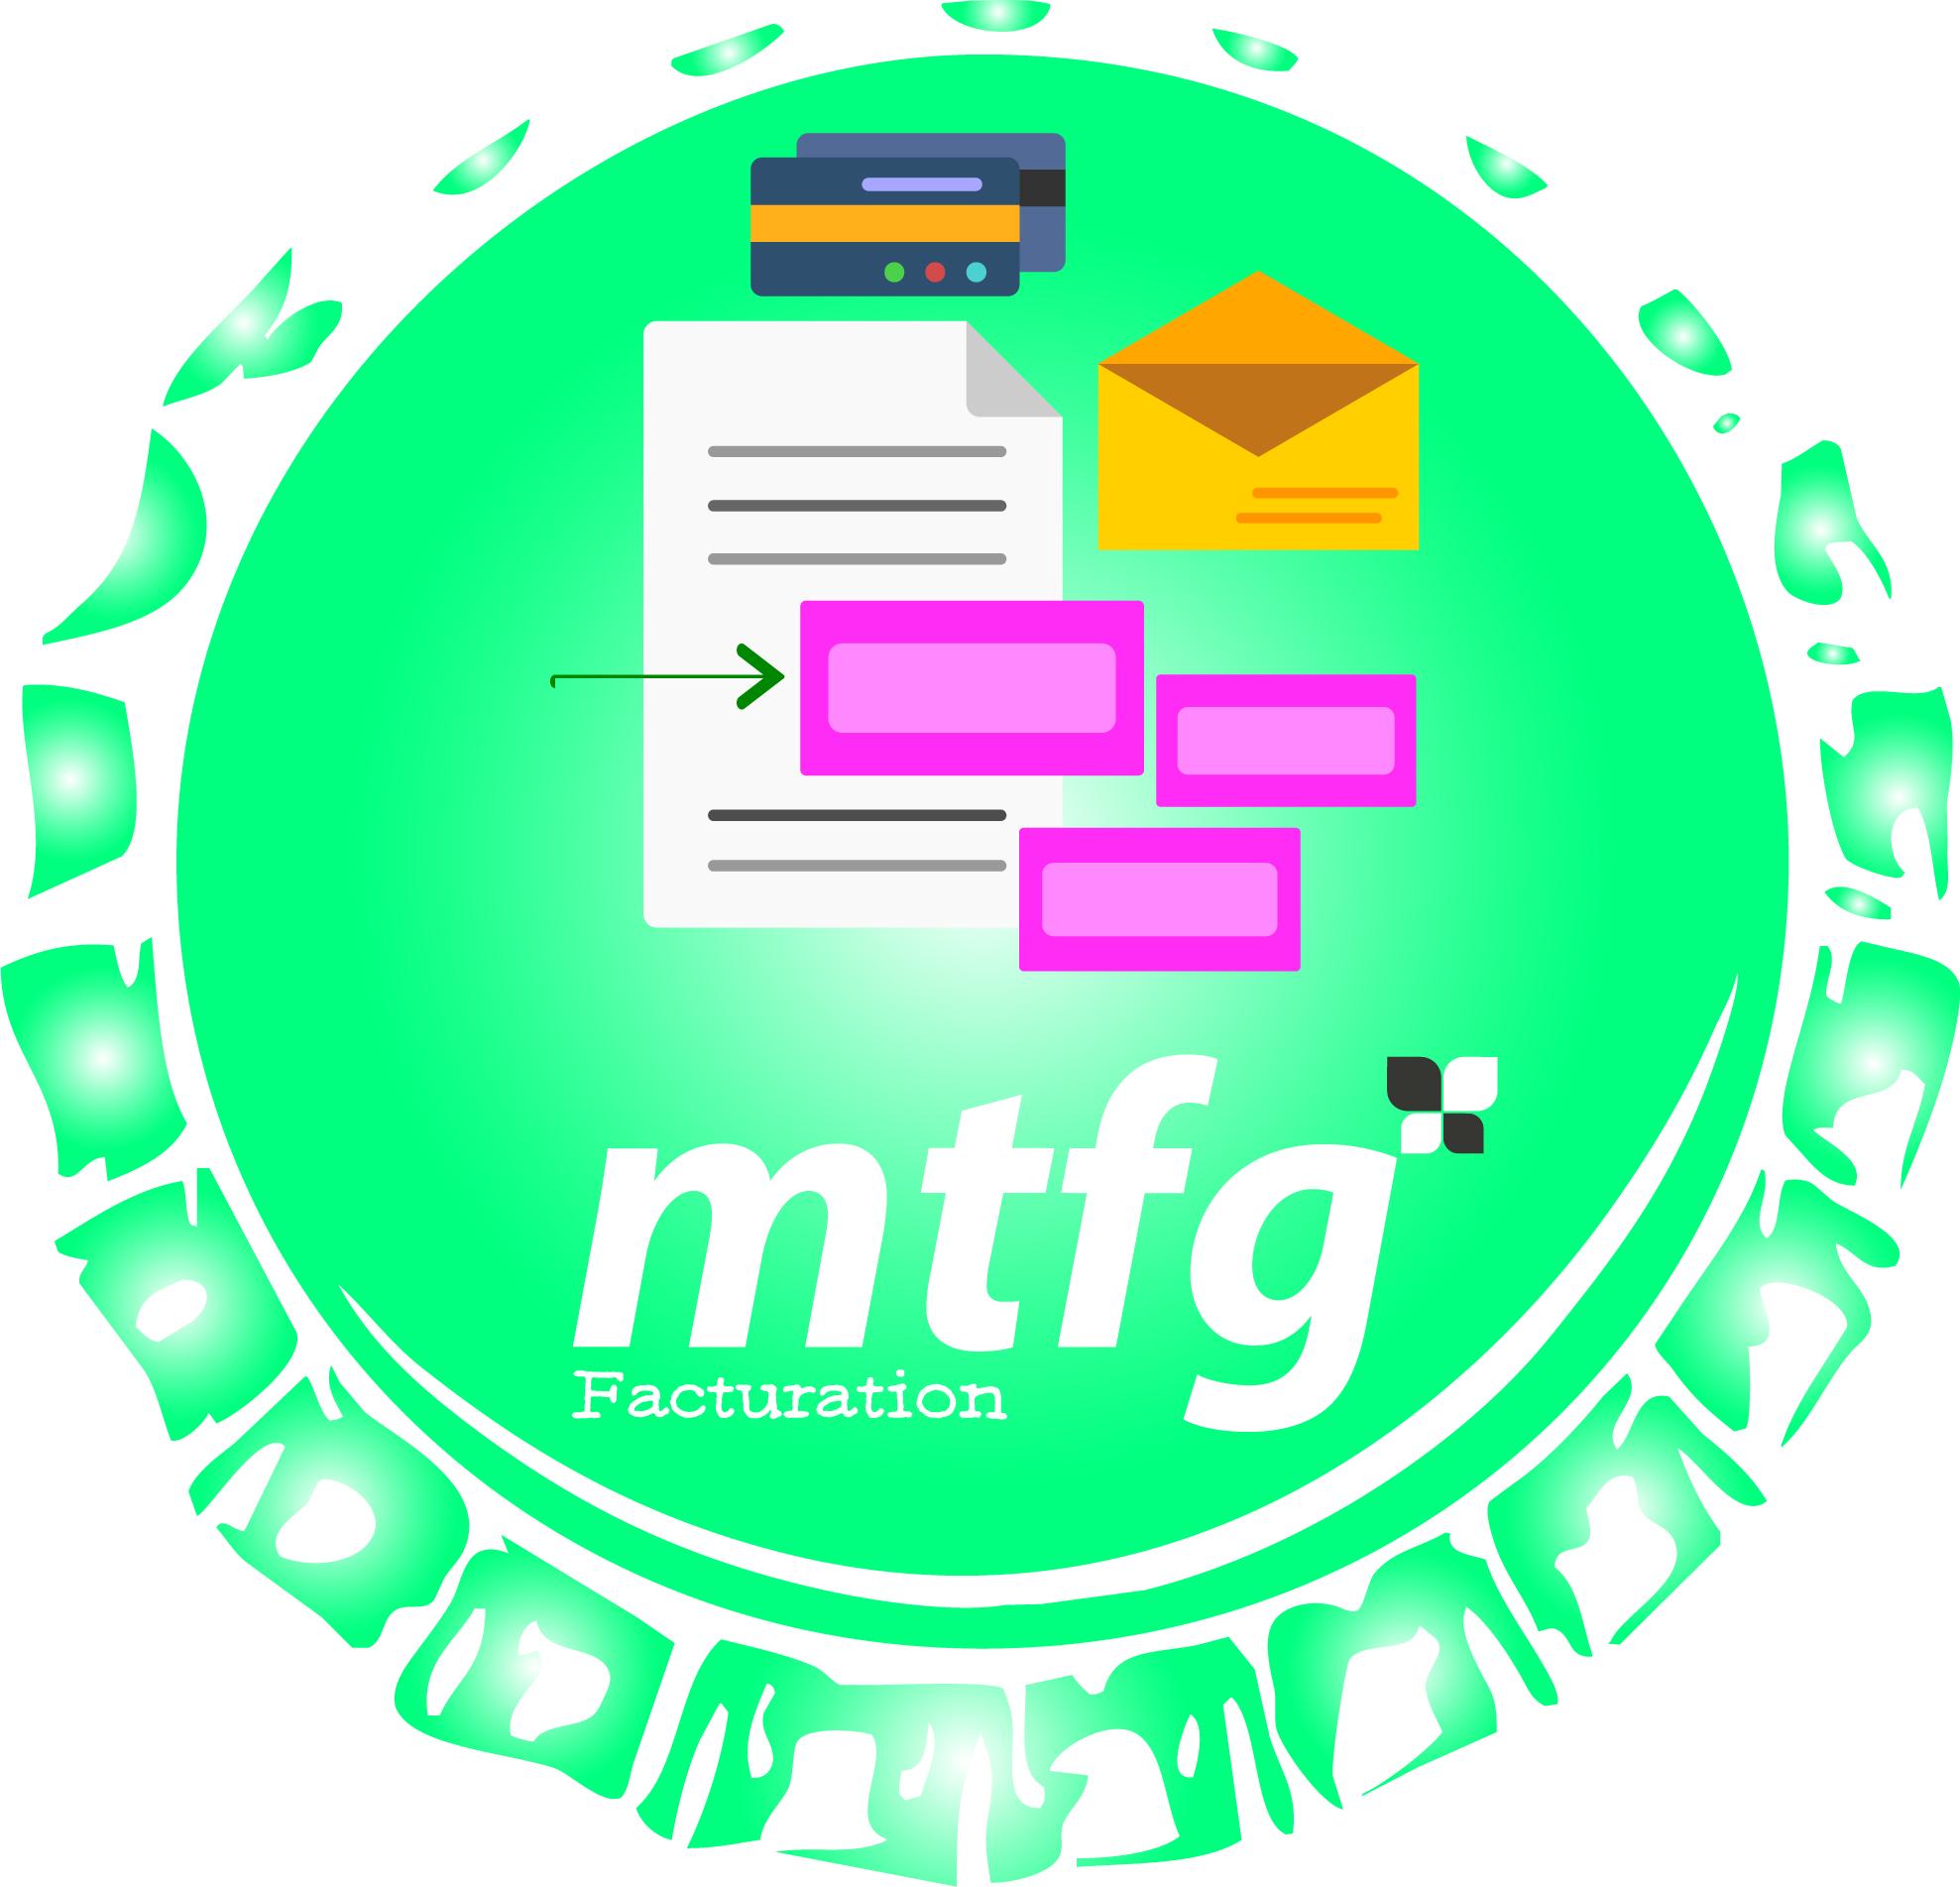 MTFG Facturation